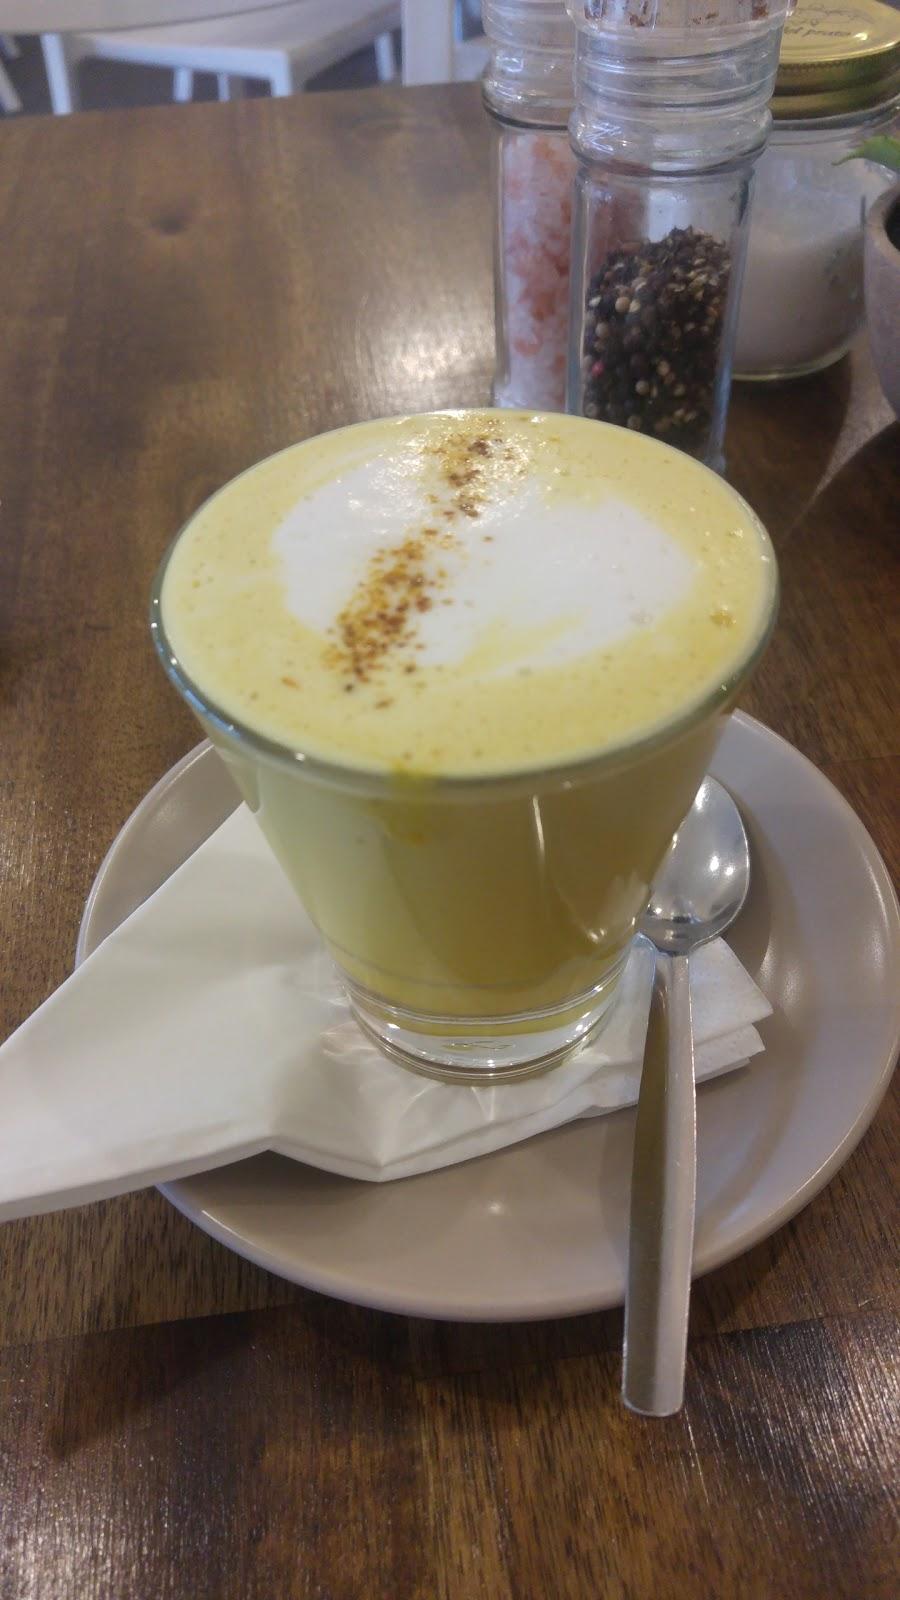 Three Beans Cafe & Deli | cafe | 7/61 Brice Ave, Mooroolbark VIC 3138, Australia | 0397272000 OR +61 3 9727 2000